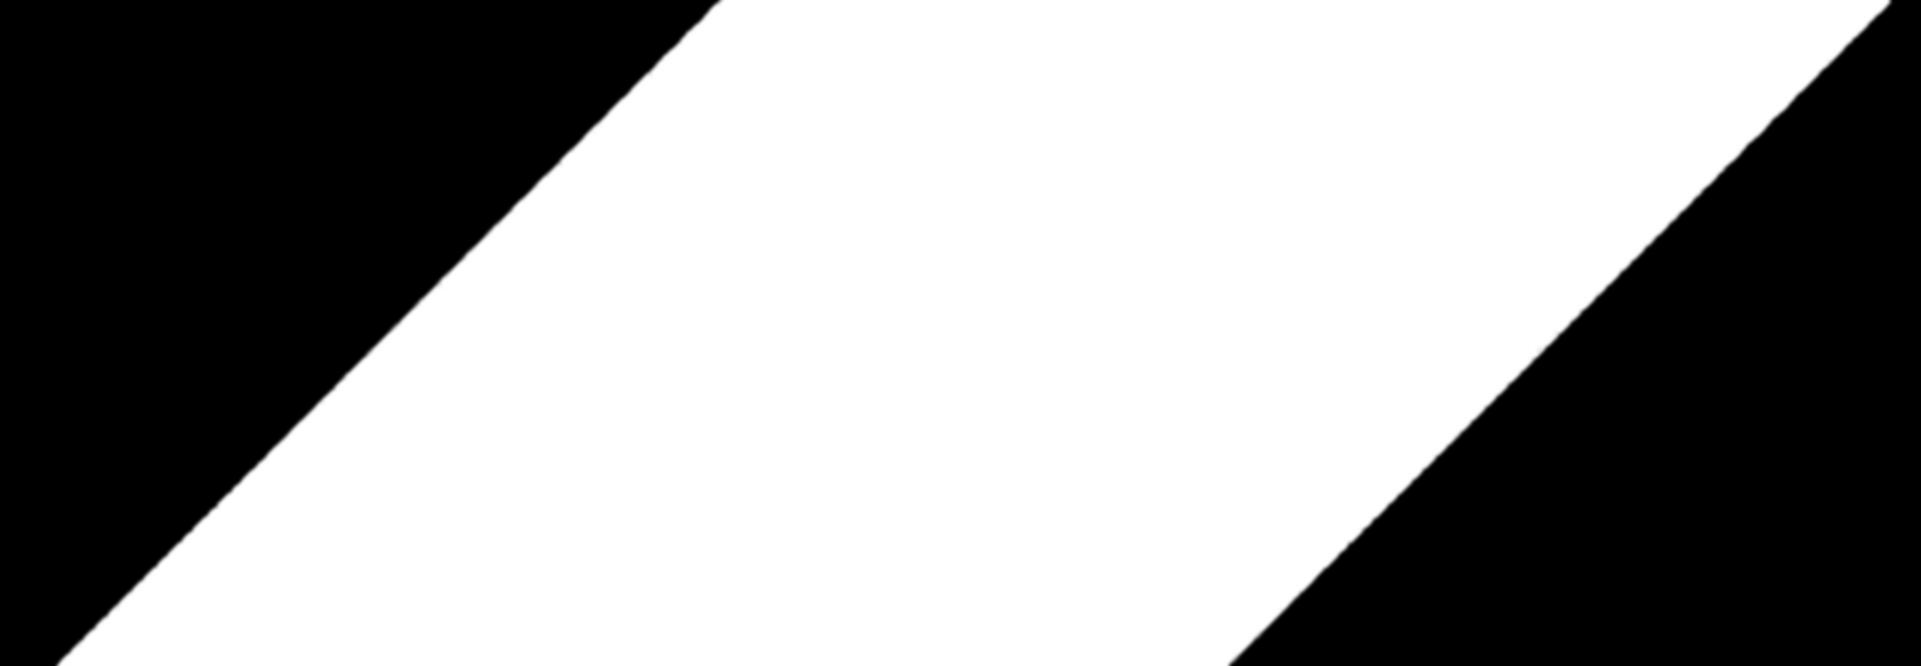 white rhombus_edited.png